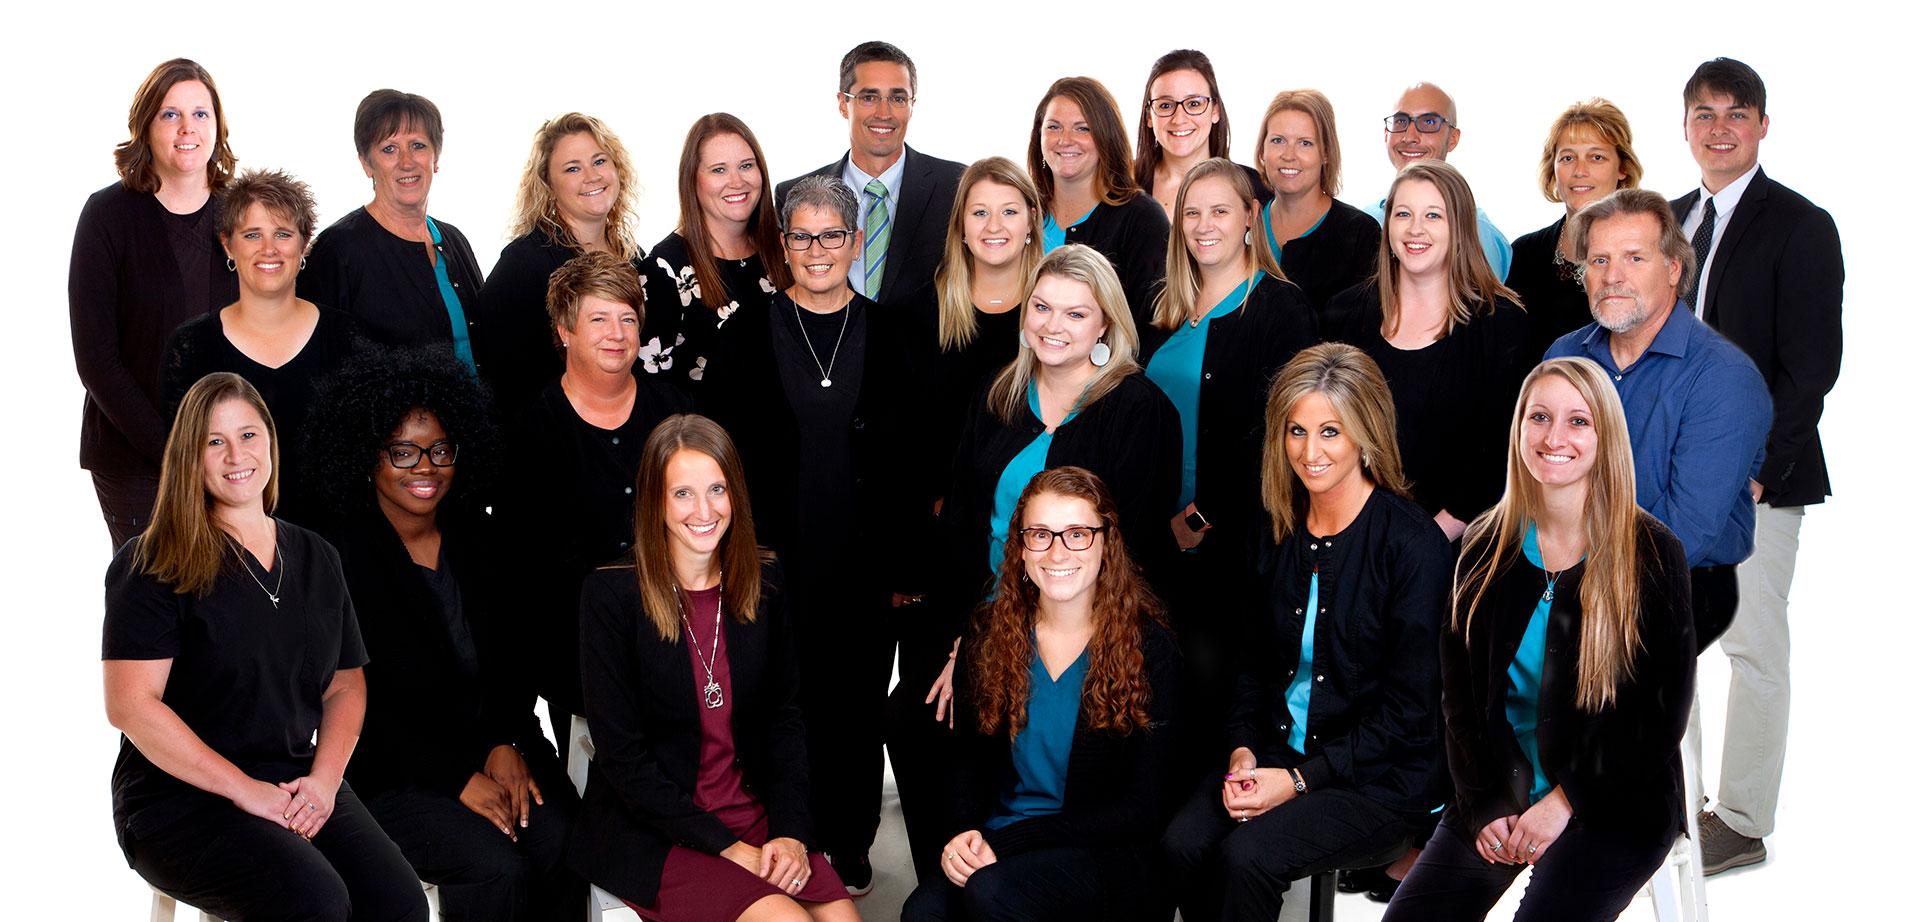 Central Vision Eyecare Staff